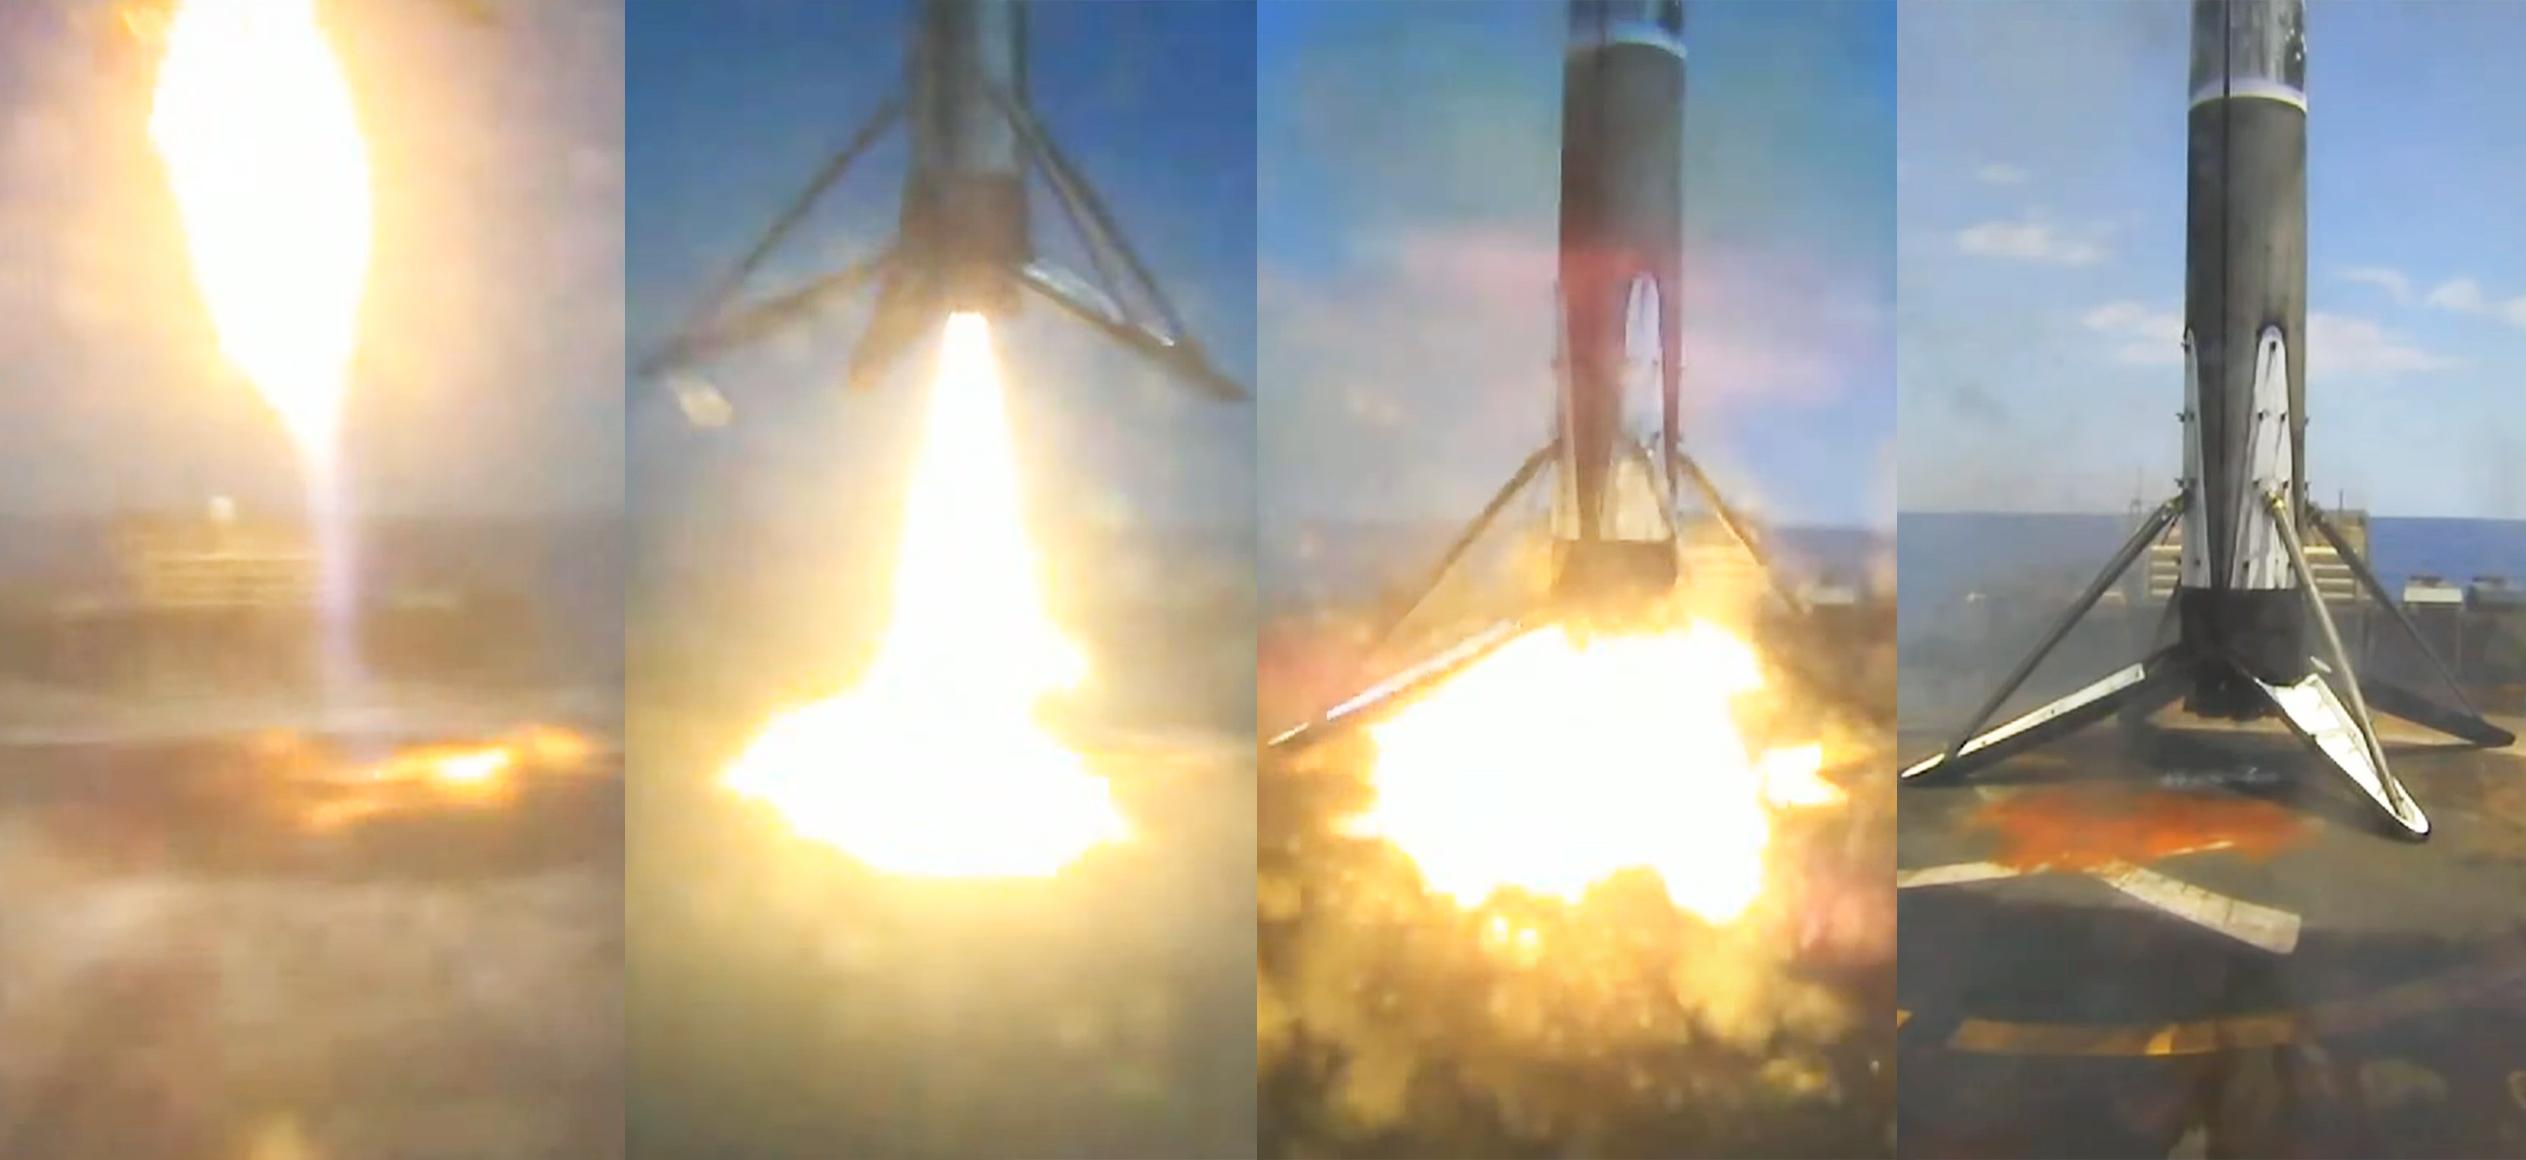 GPS III SV05 Falcon 9 B1062 061721 webcast (SpaceX) JRTI landing